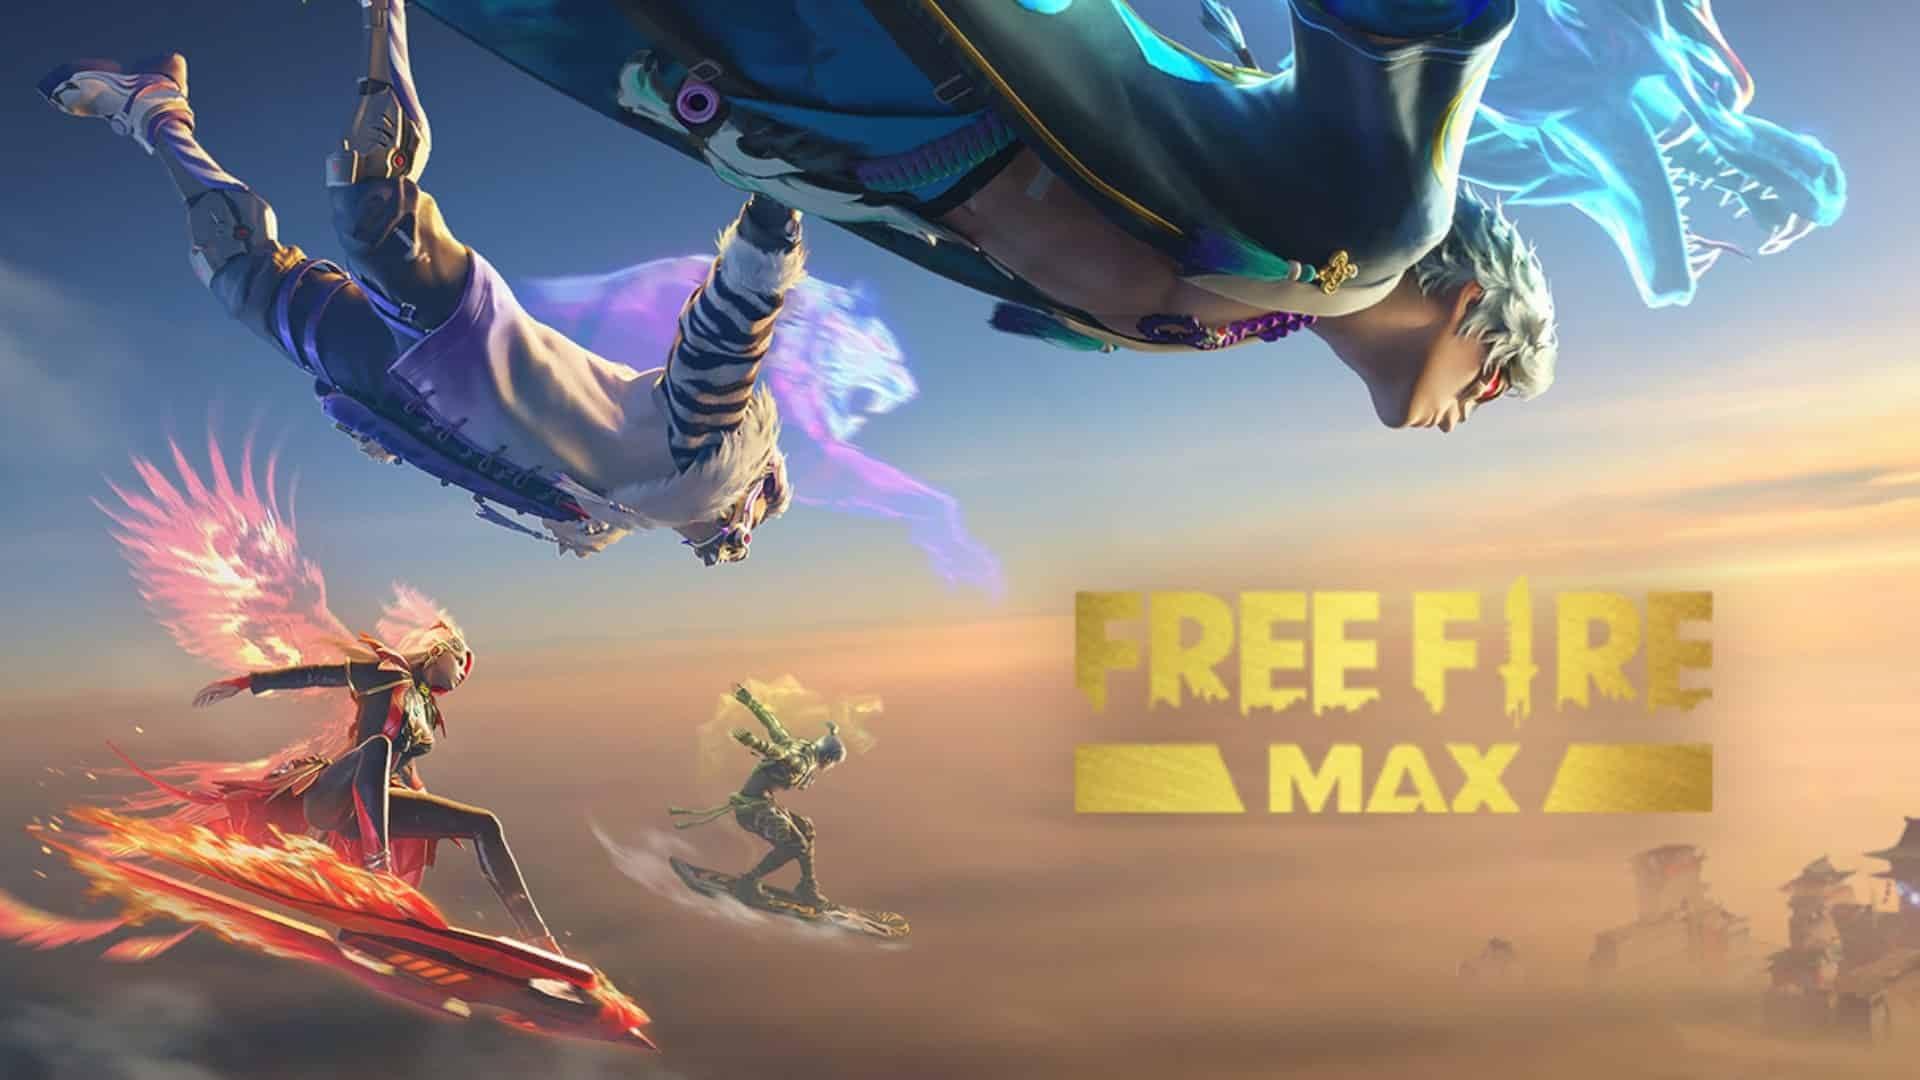 descargar Free Fire MAX gratis